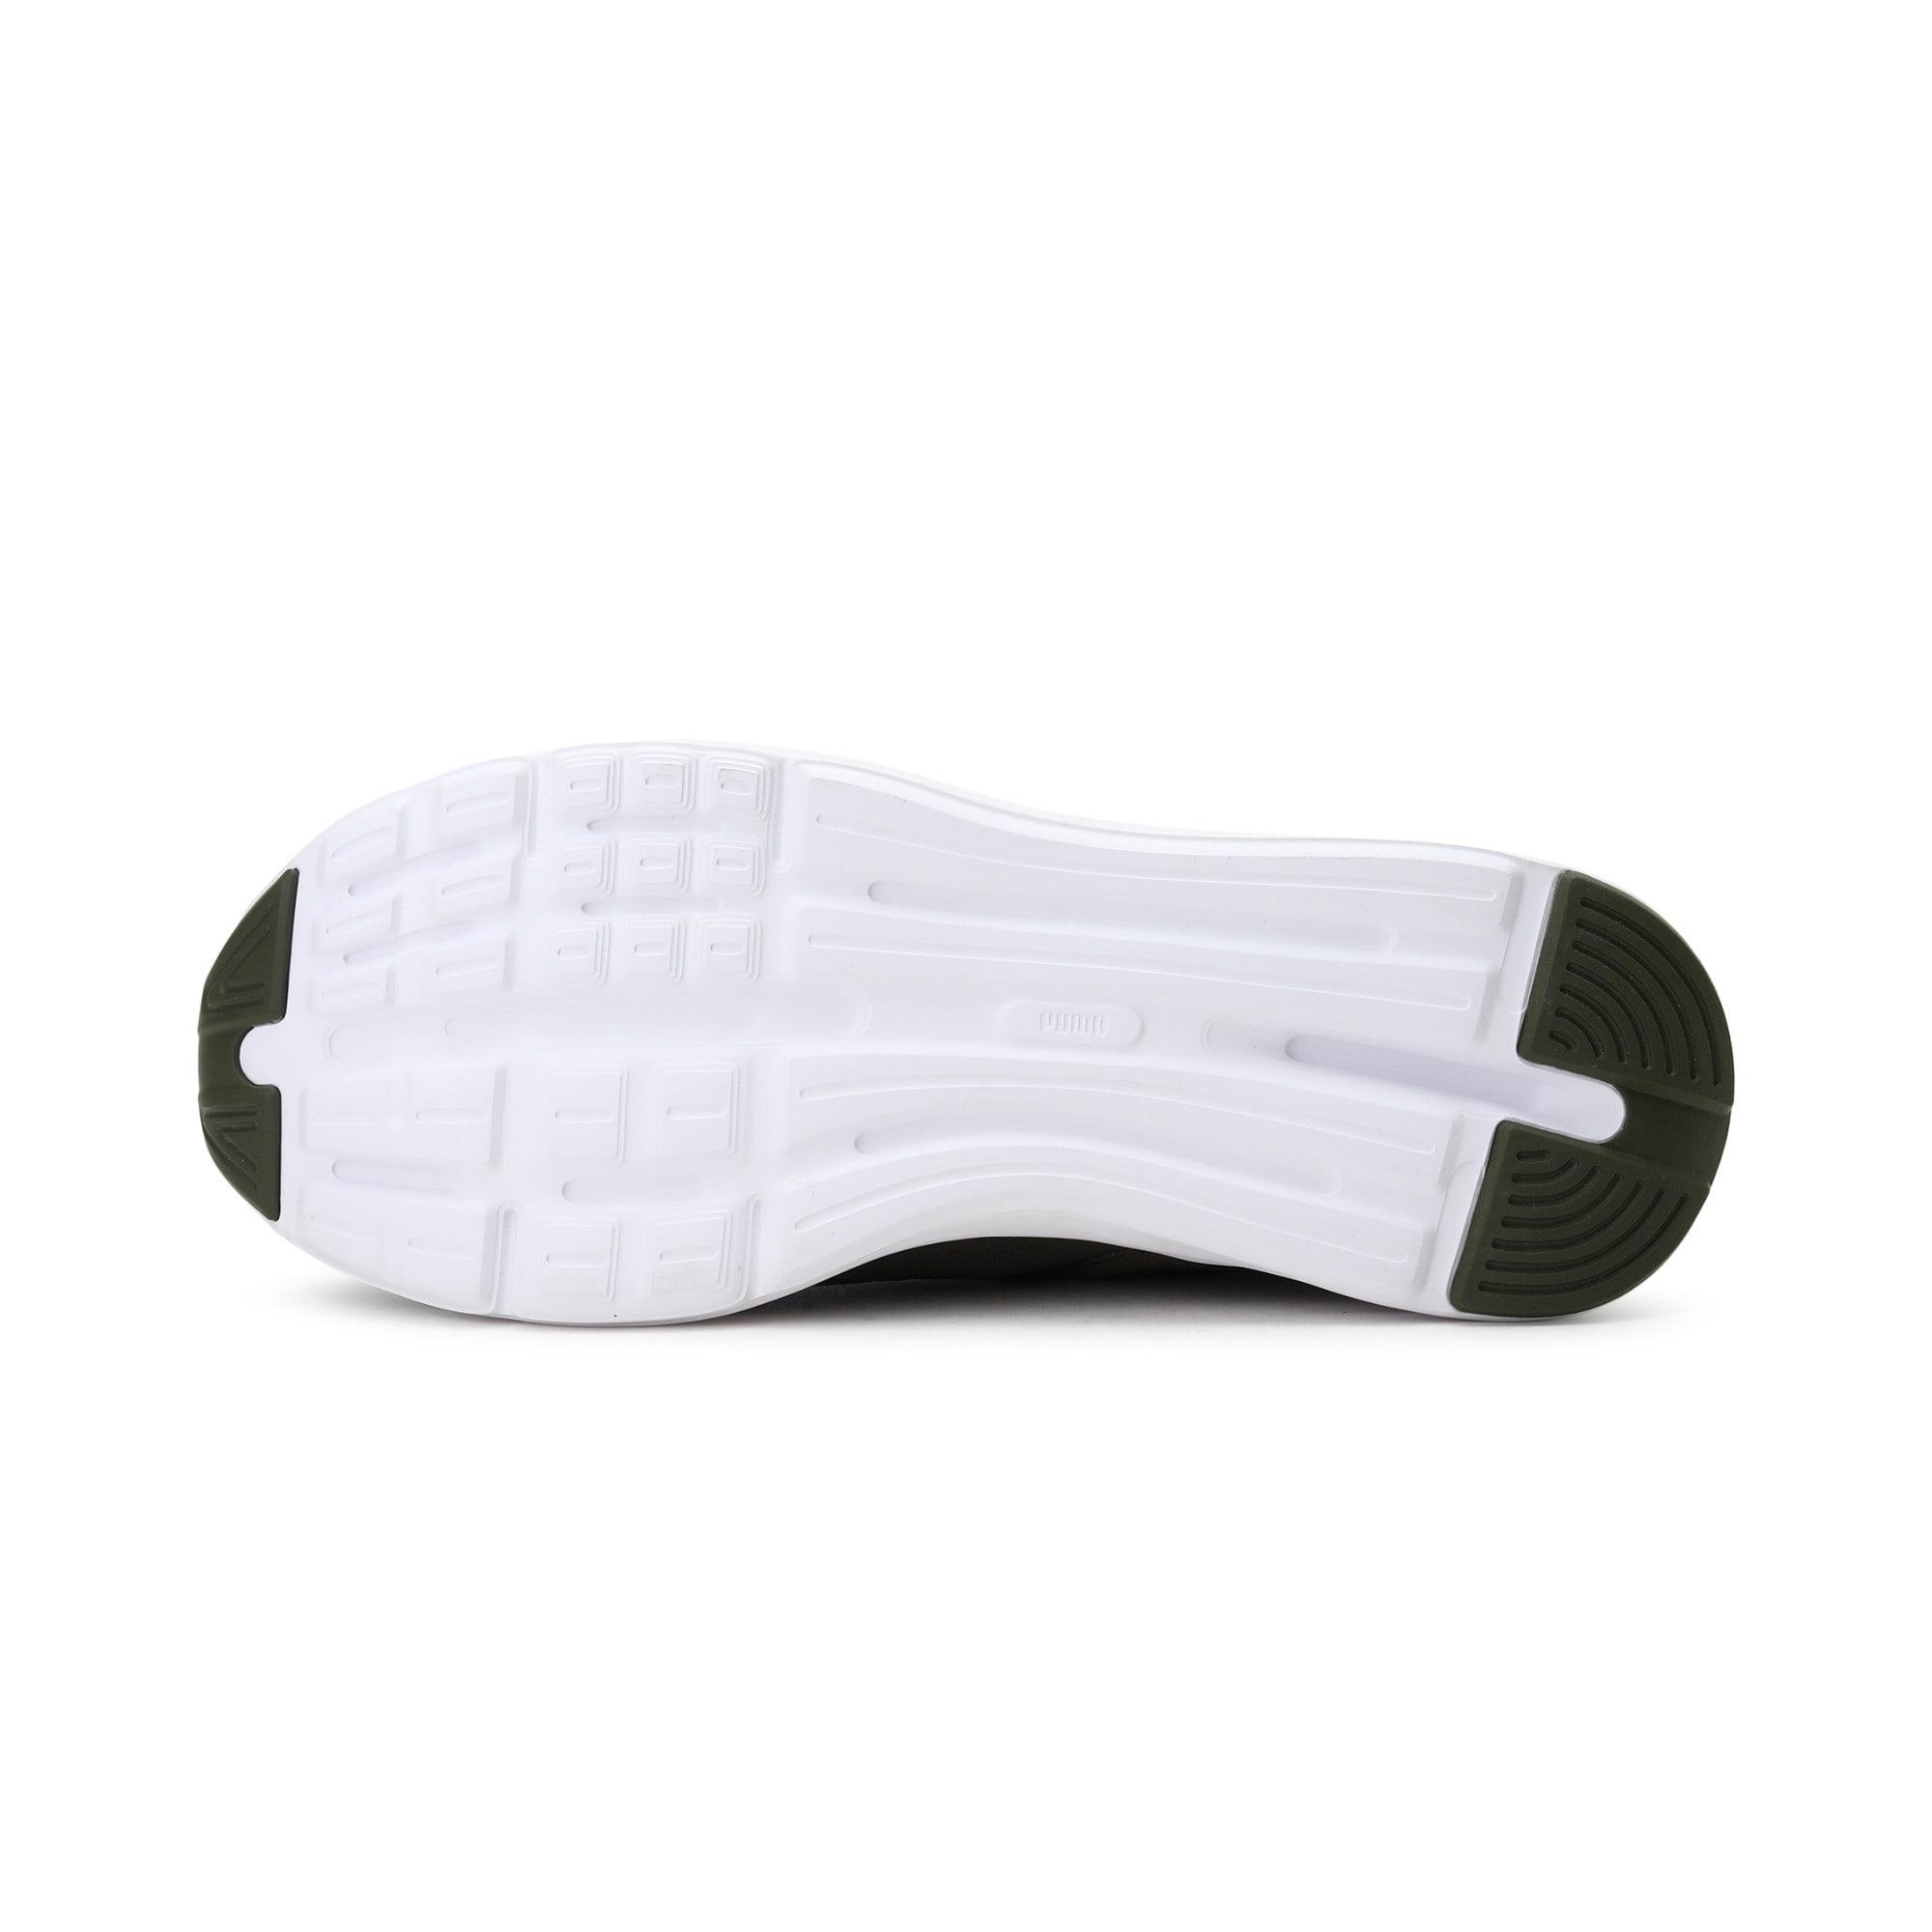 Thumbnail 4 of Enzo Mesh Men's Running Shoes, Olive Night-Puma White, medium-IND